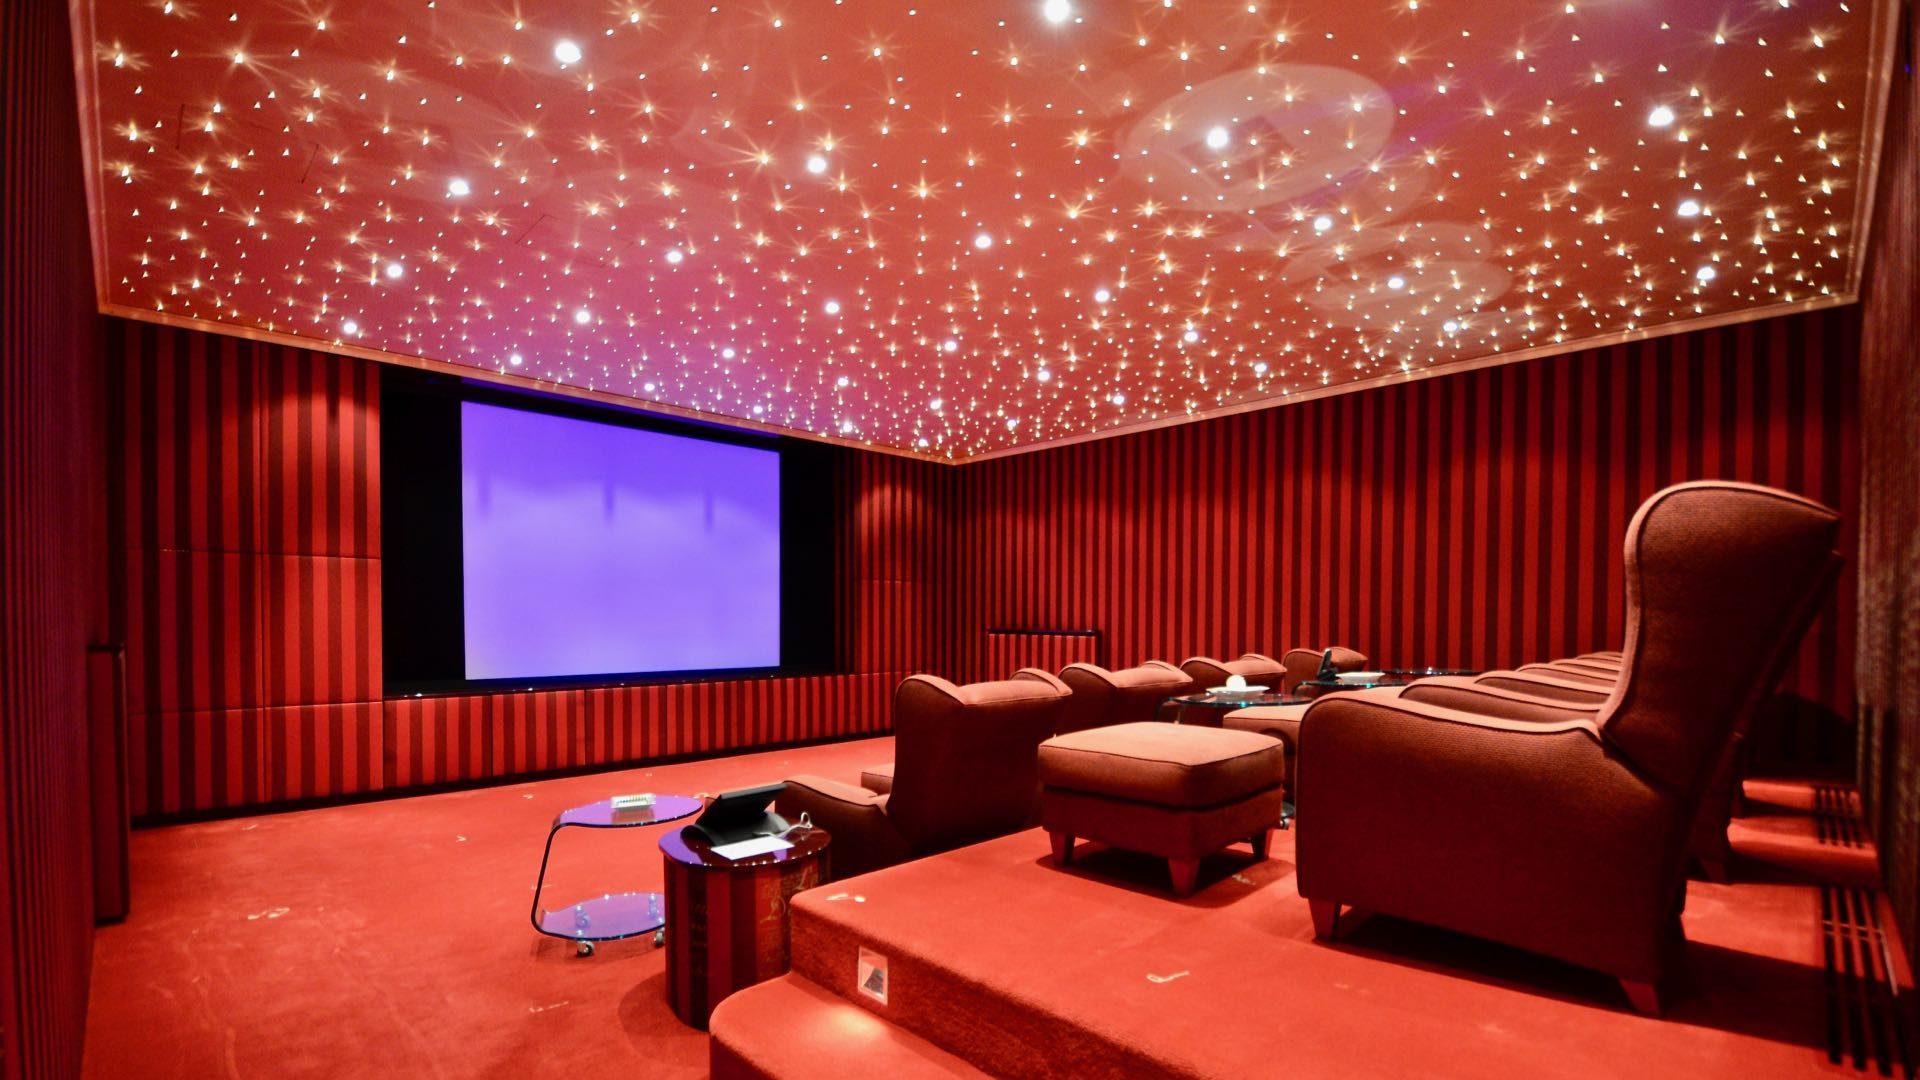 Cinema room of the luxury property